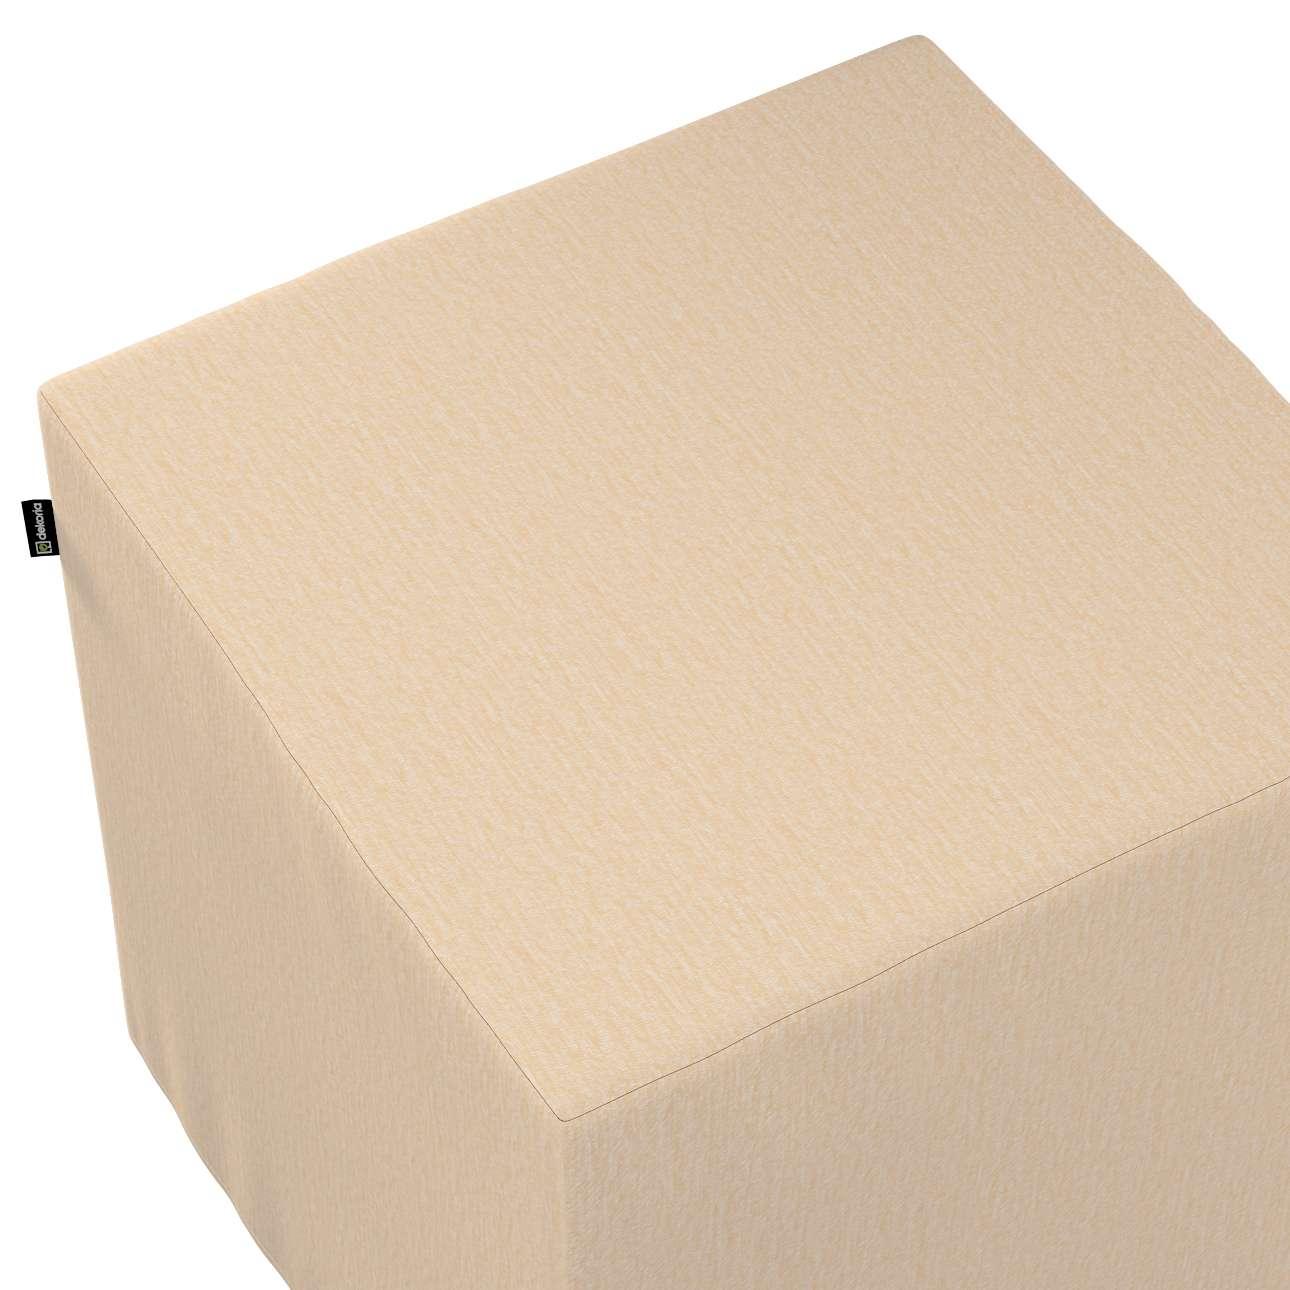 Pufa kostka w kolekcji Chenille, tkanina: 702-22